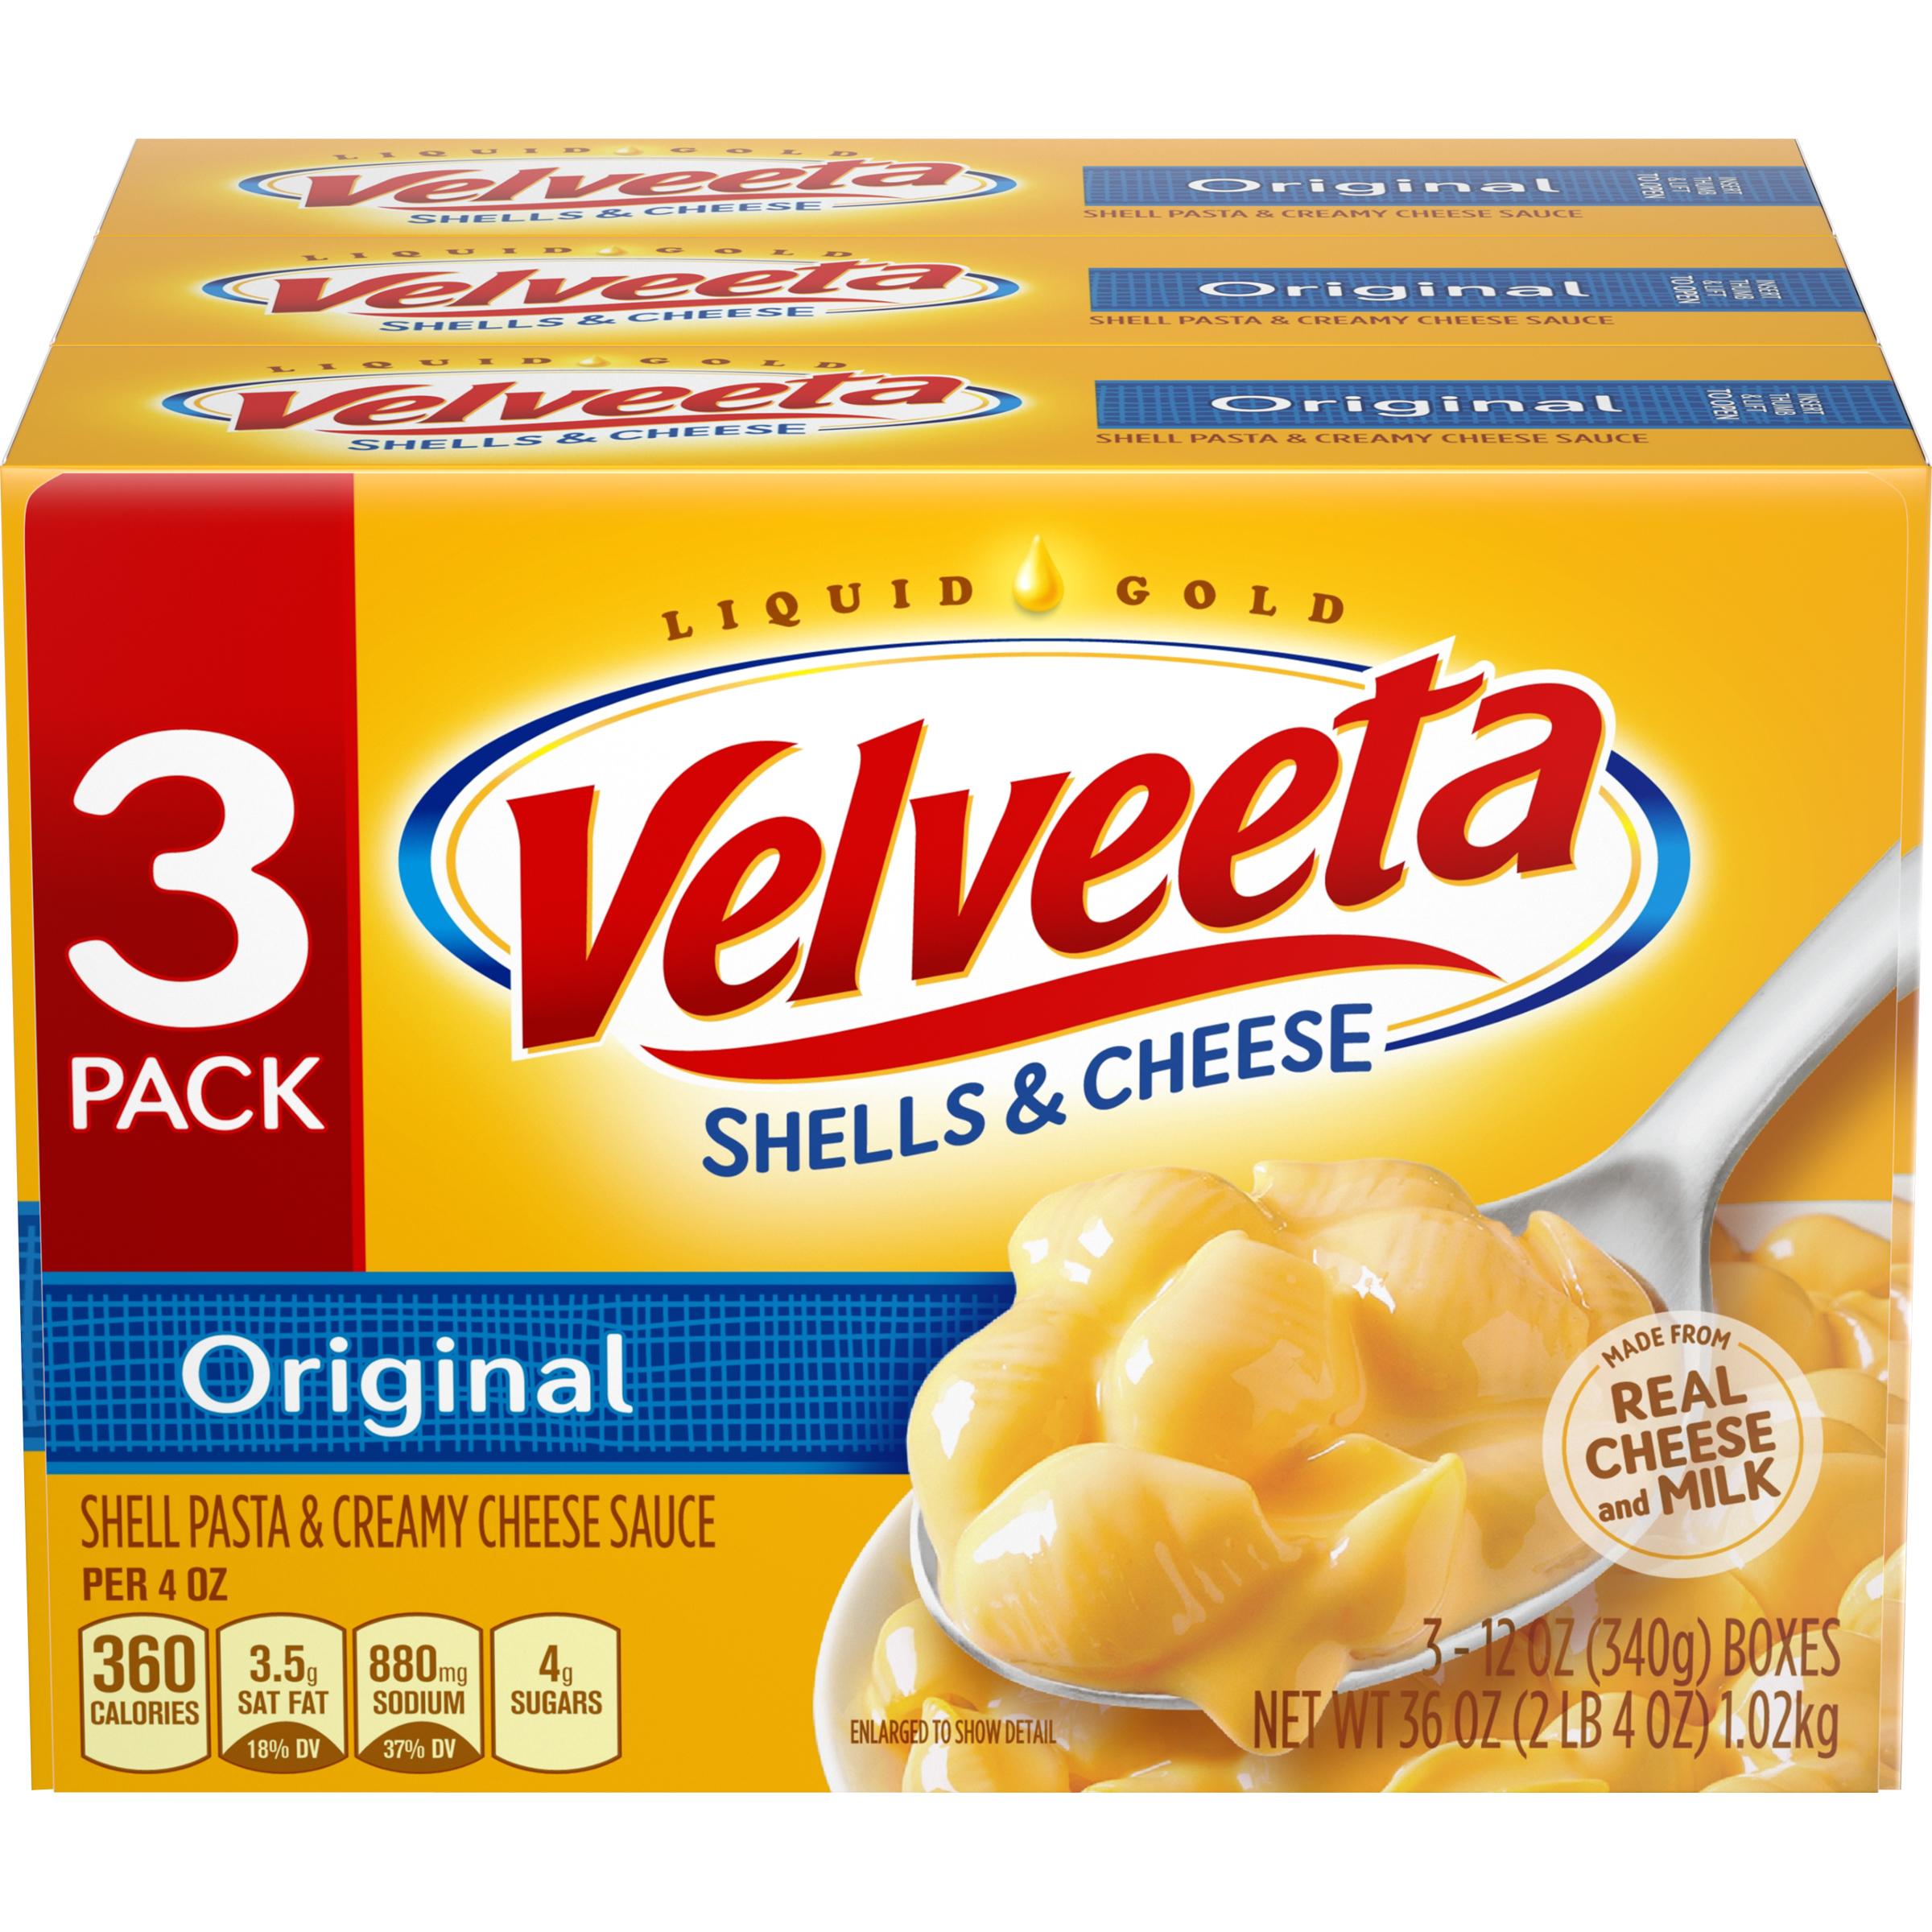 Velveeta Original Shells & Cheese Dinner